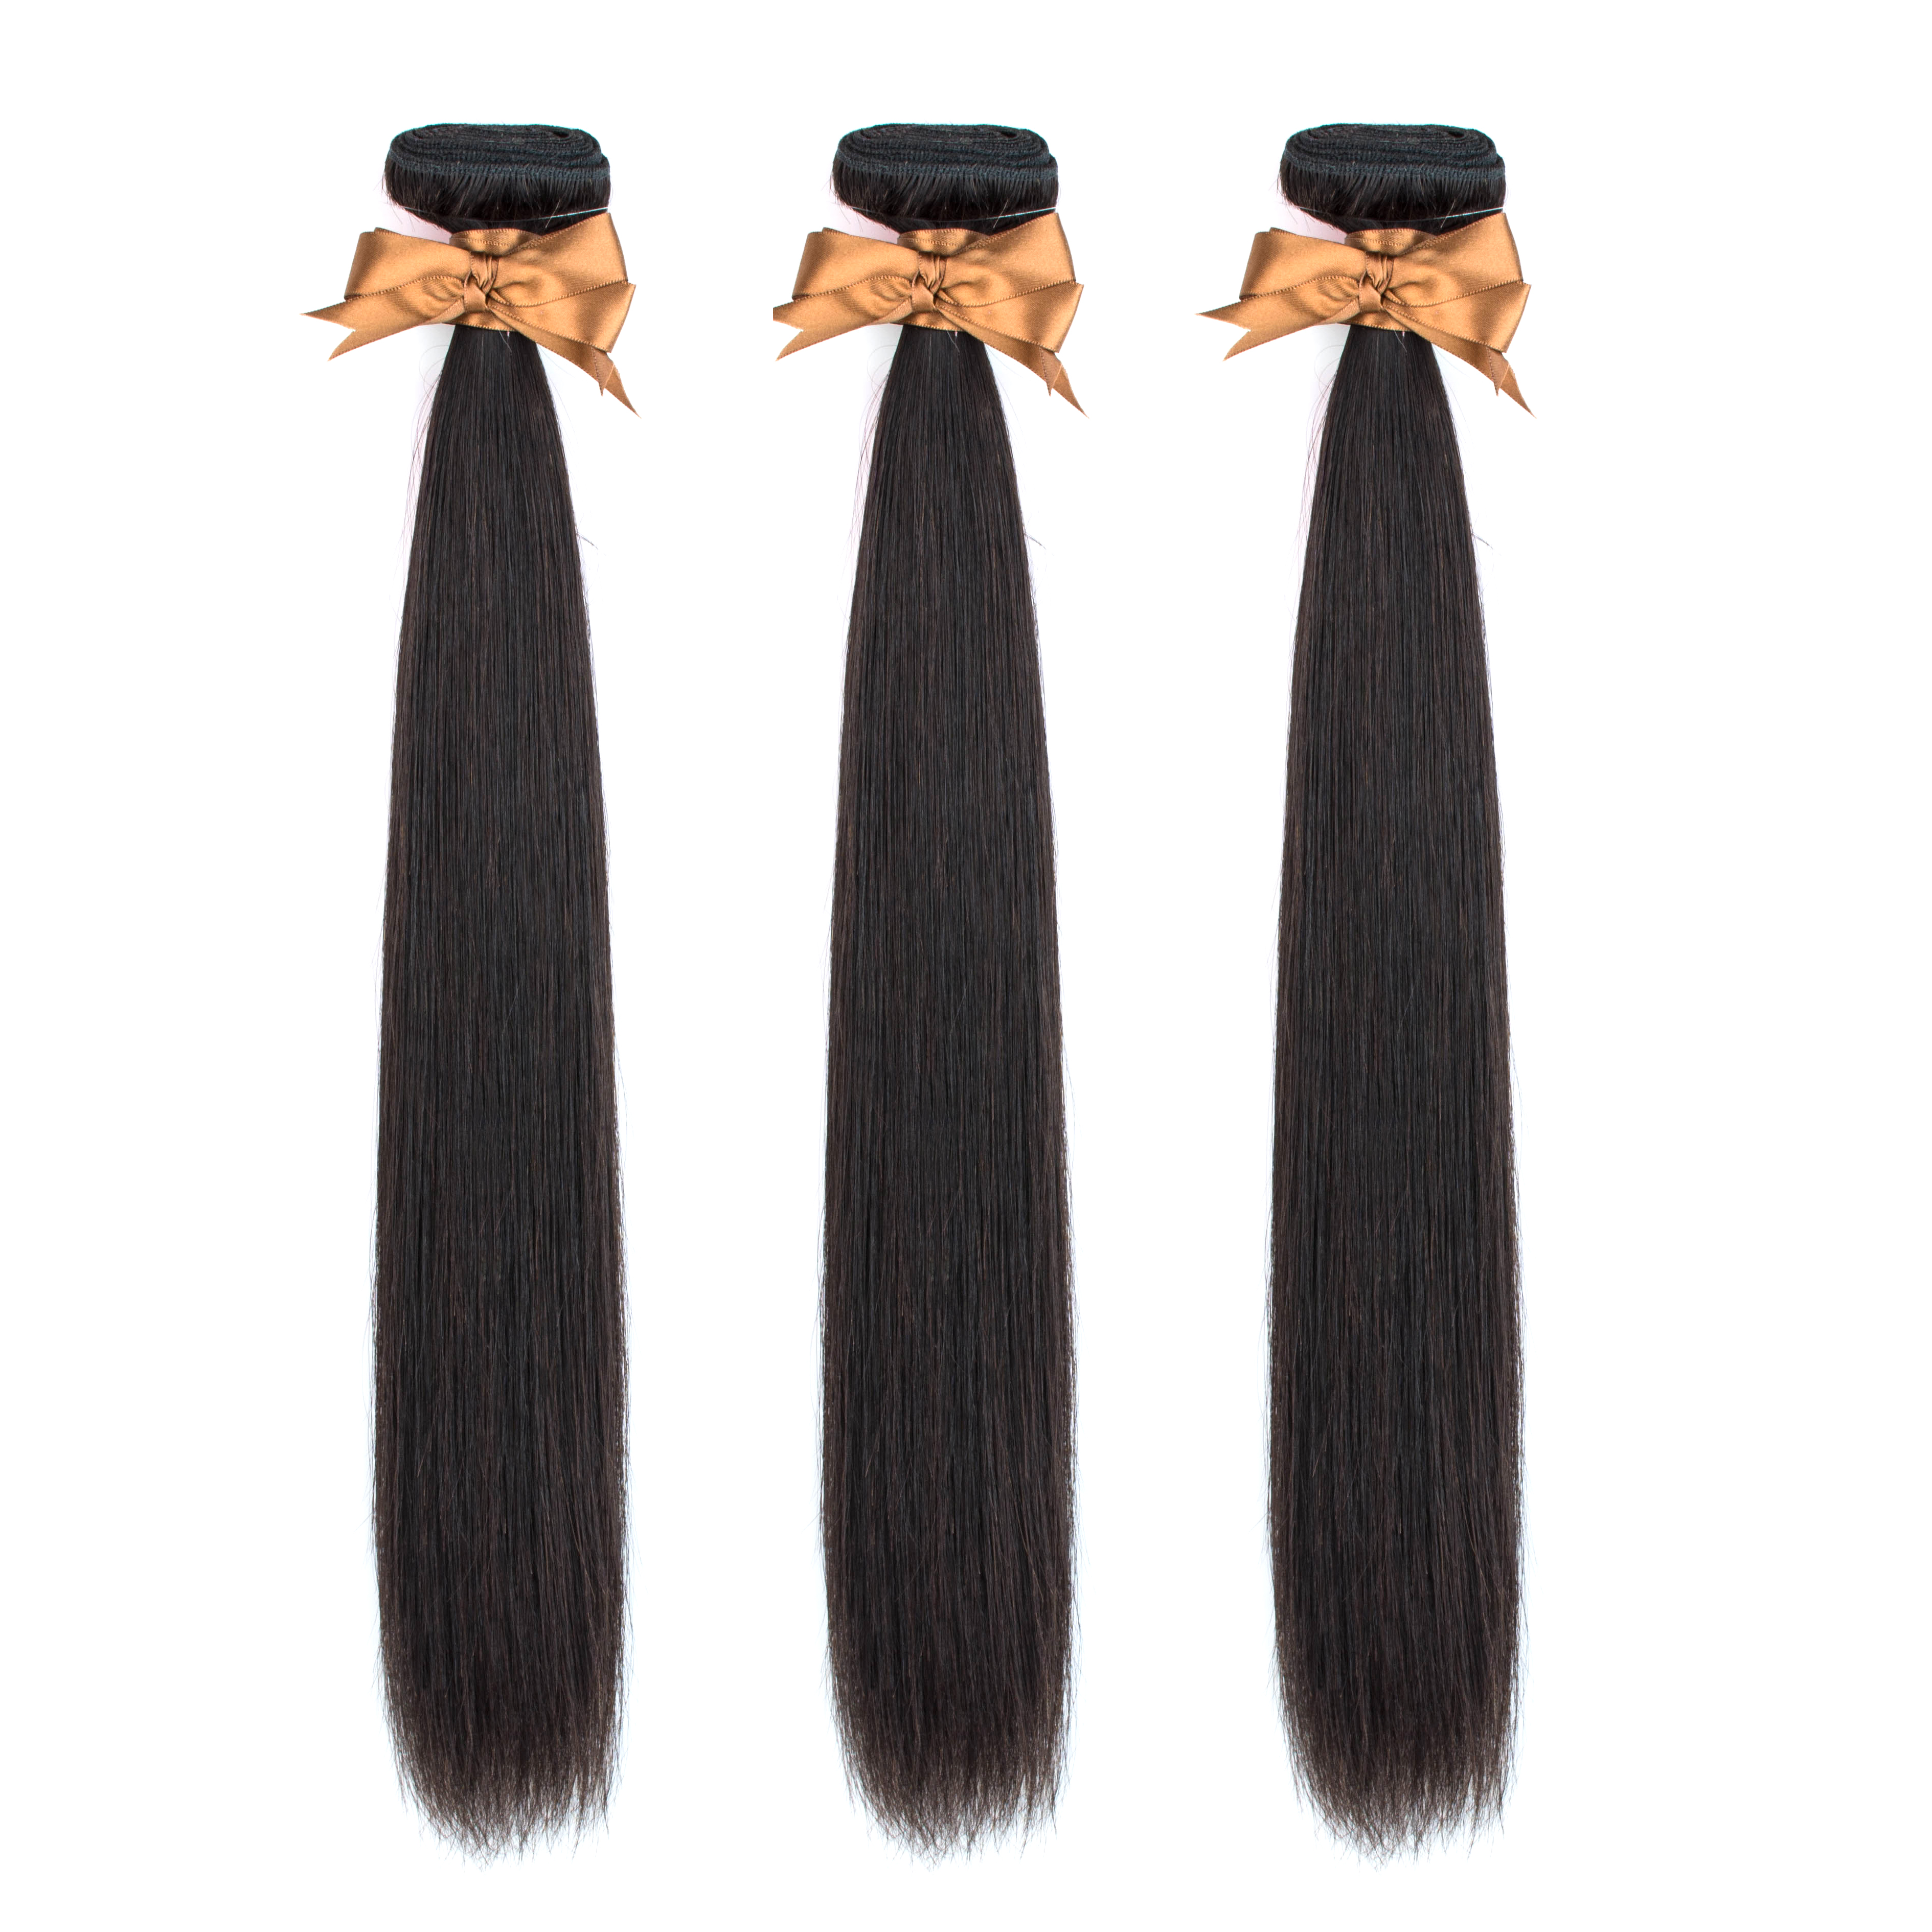 Beaudiva Straight Hair 3 Bundles Brazilian Hair Weave Bundles 100% Human Hair Bundles Remy Hair Weave 3 Pieces